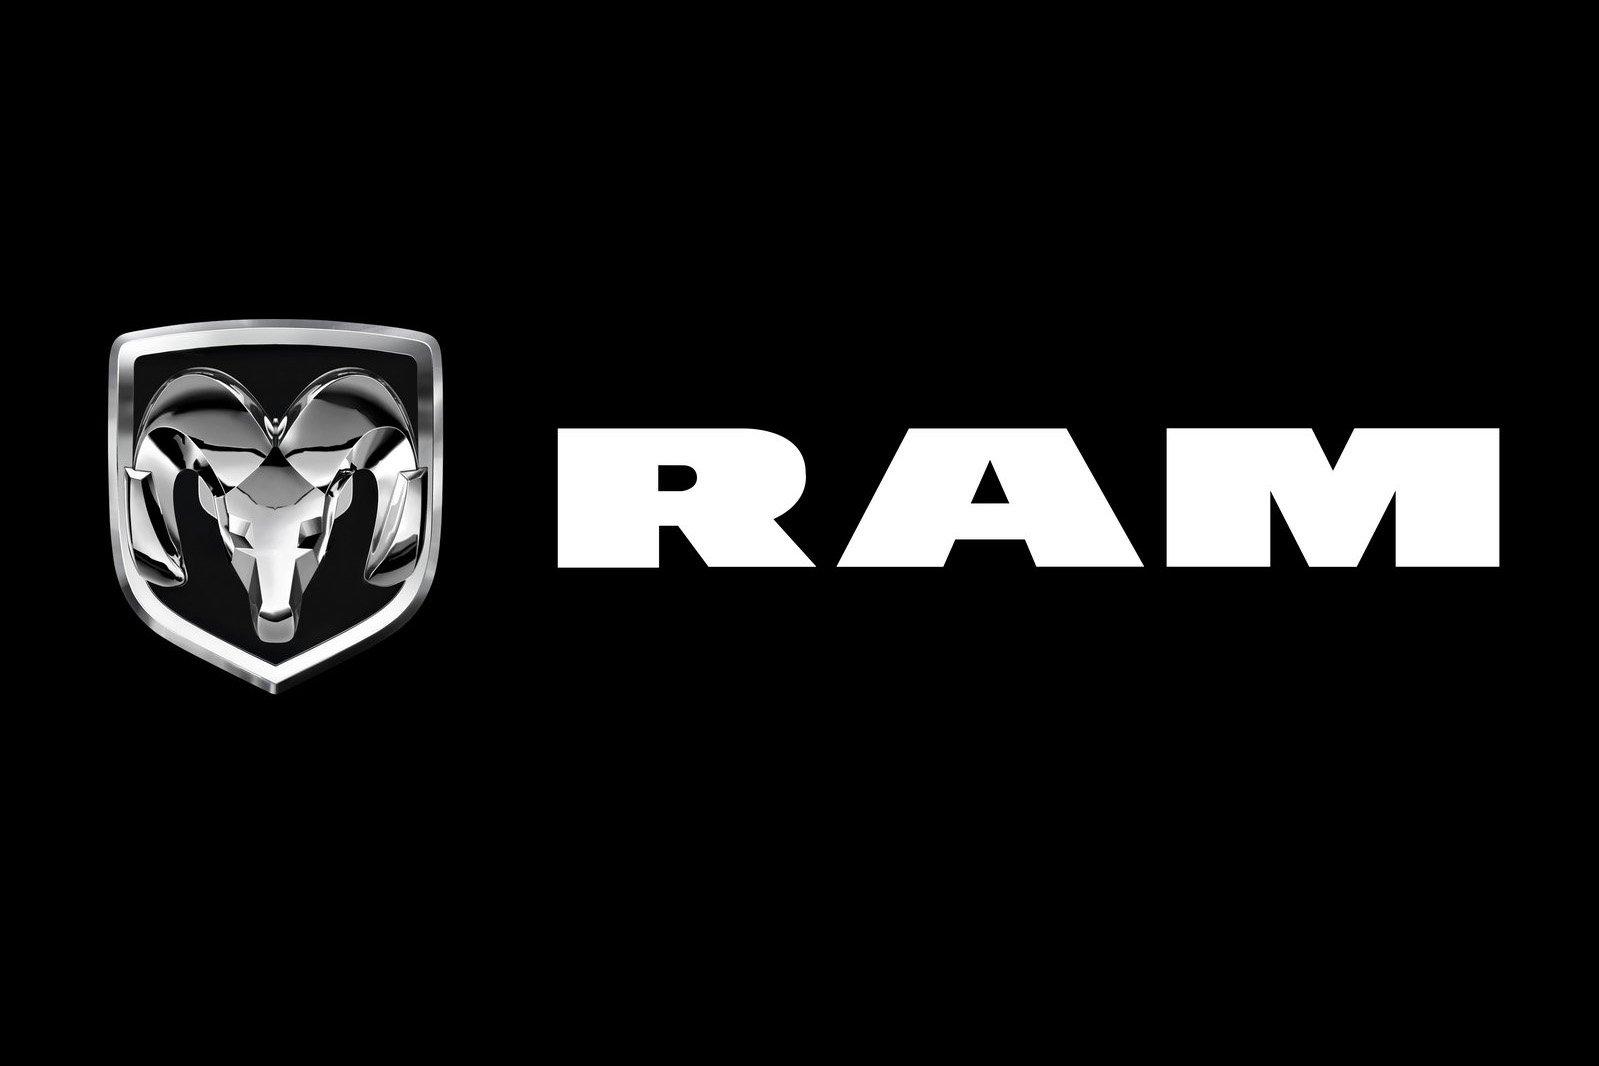 ram logo dodge ram logo web ram logo low resolution ram logo blue ram 1599x1066